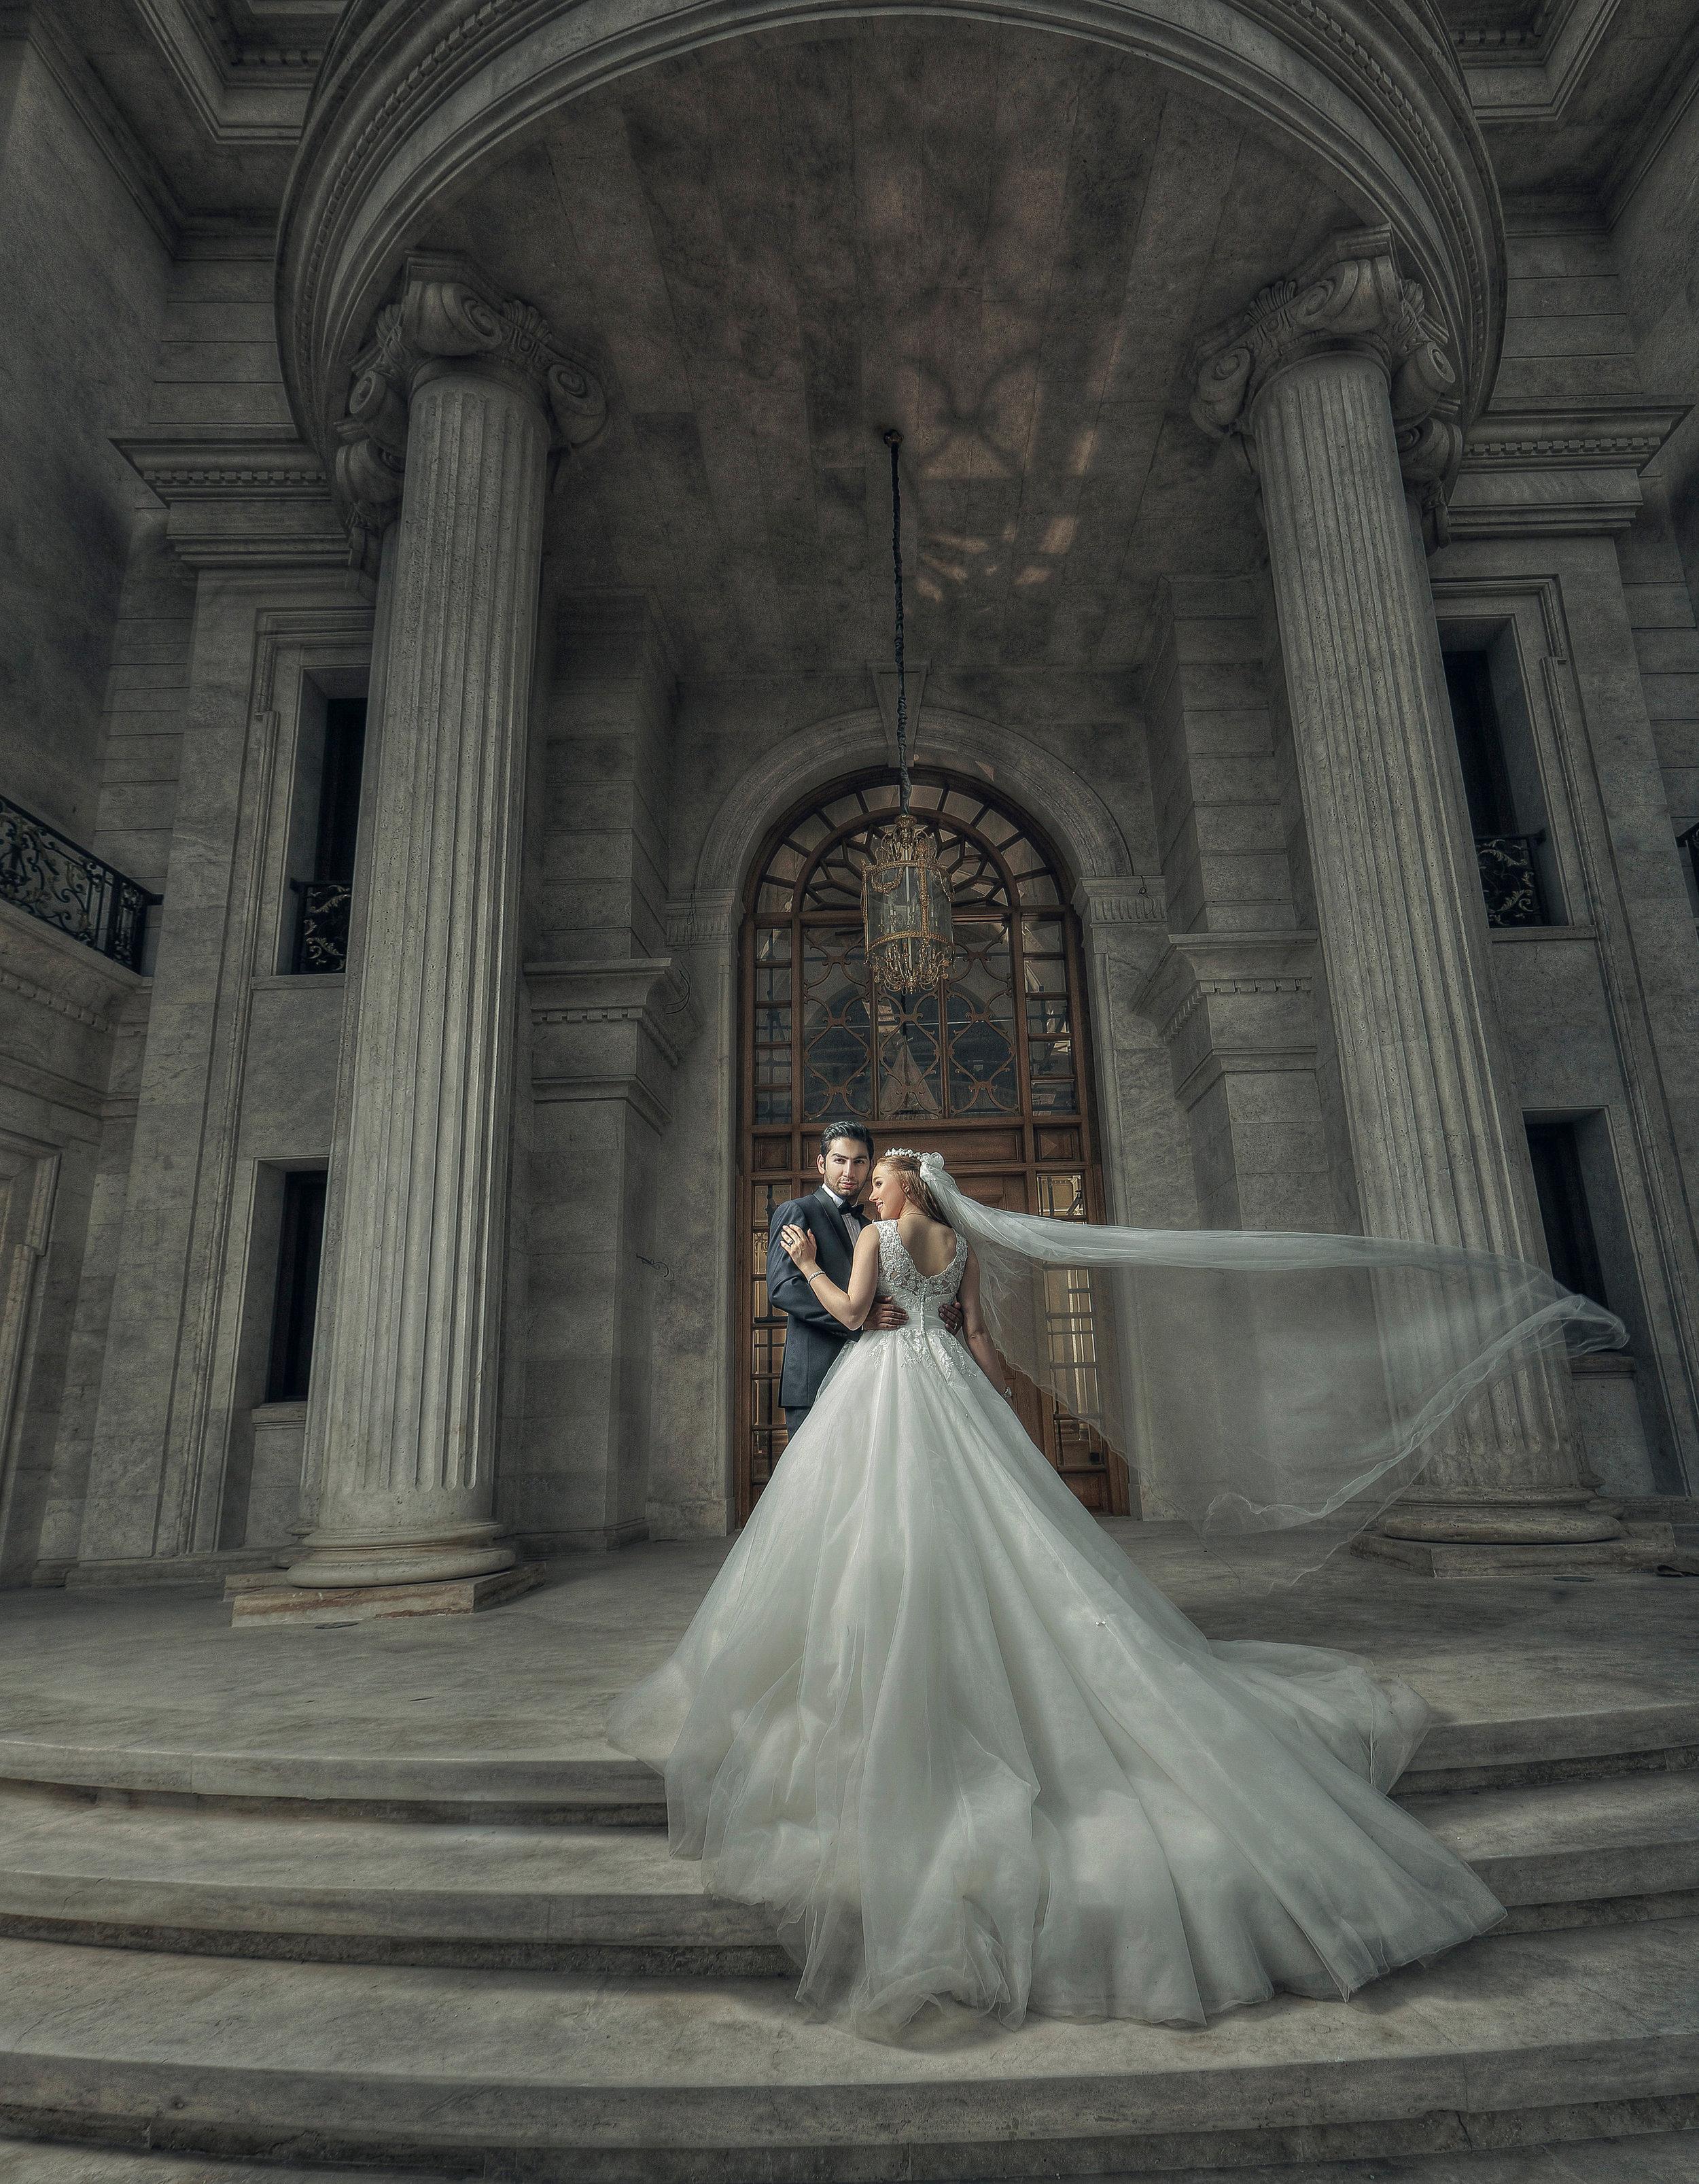 wedding-photography-Miami-Fort-lauderdale-0001.jpg